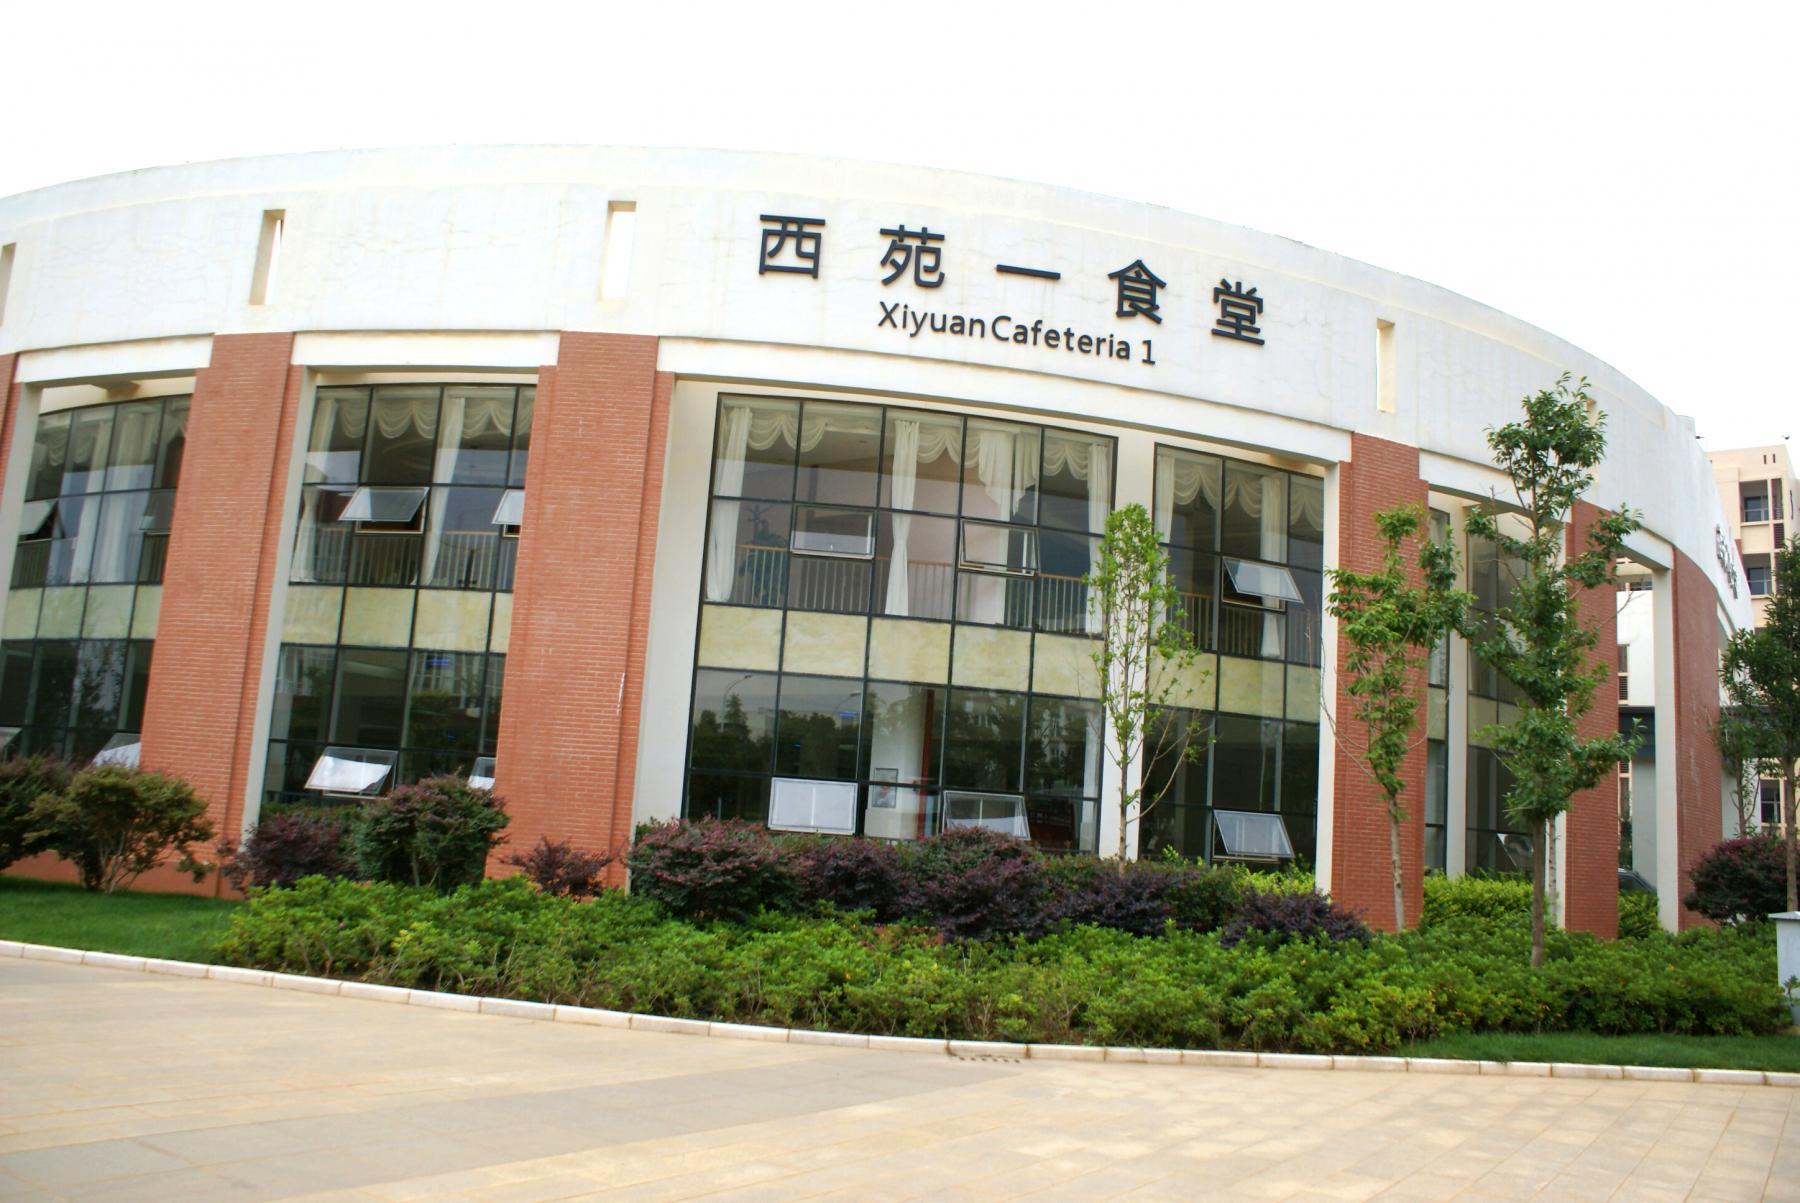 KMU building